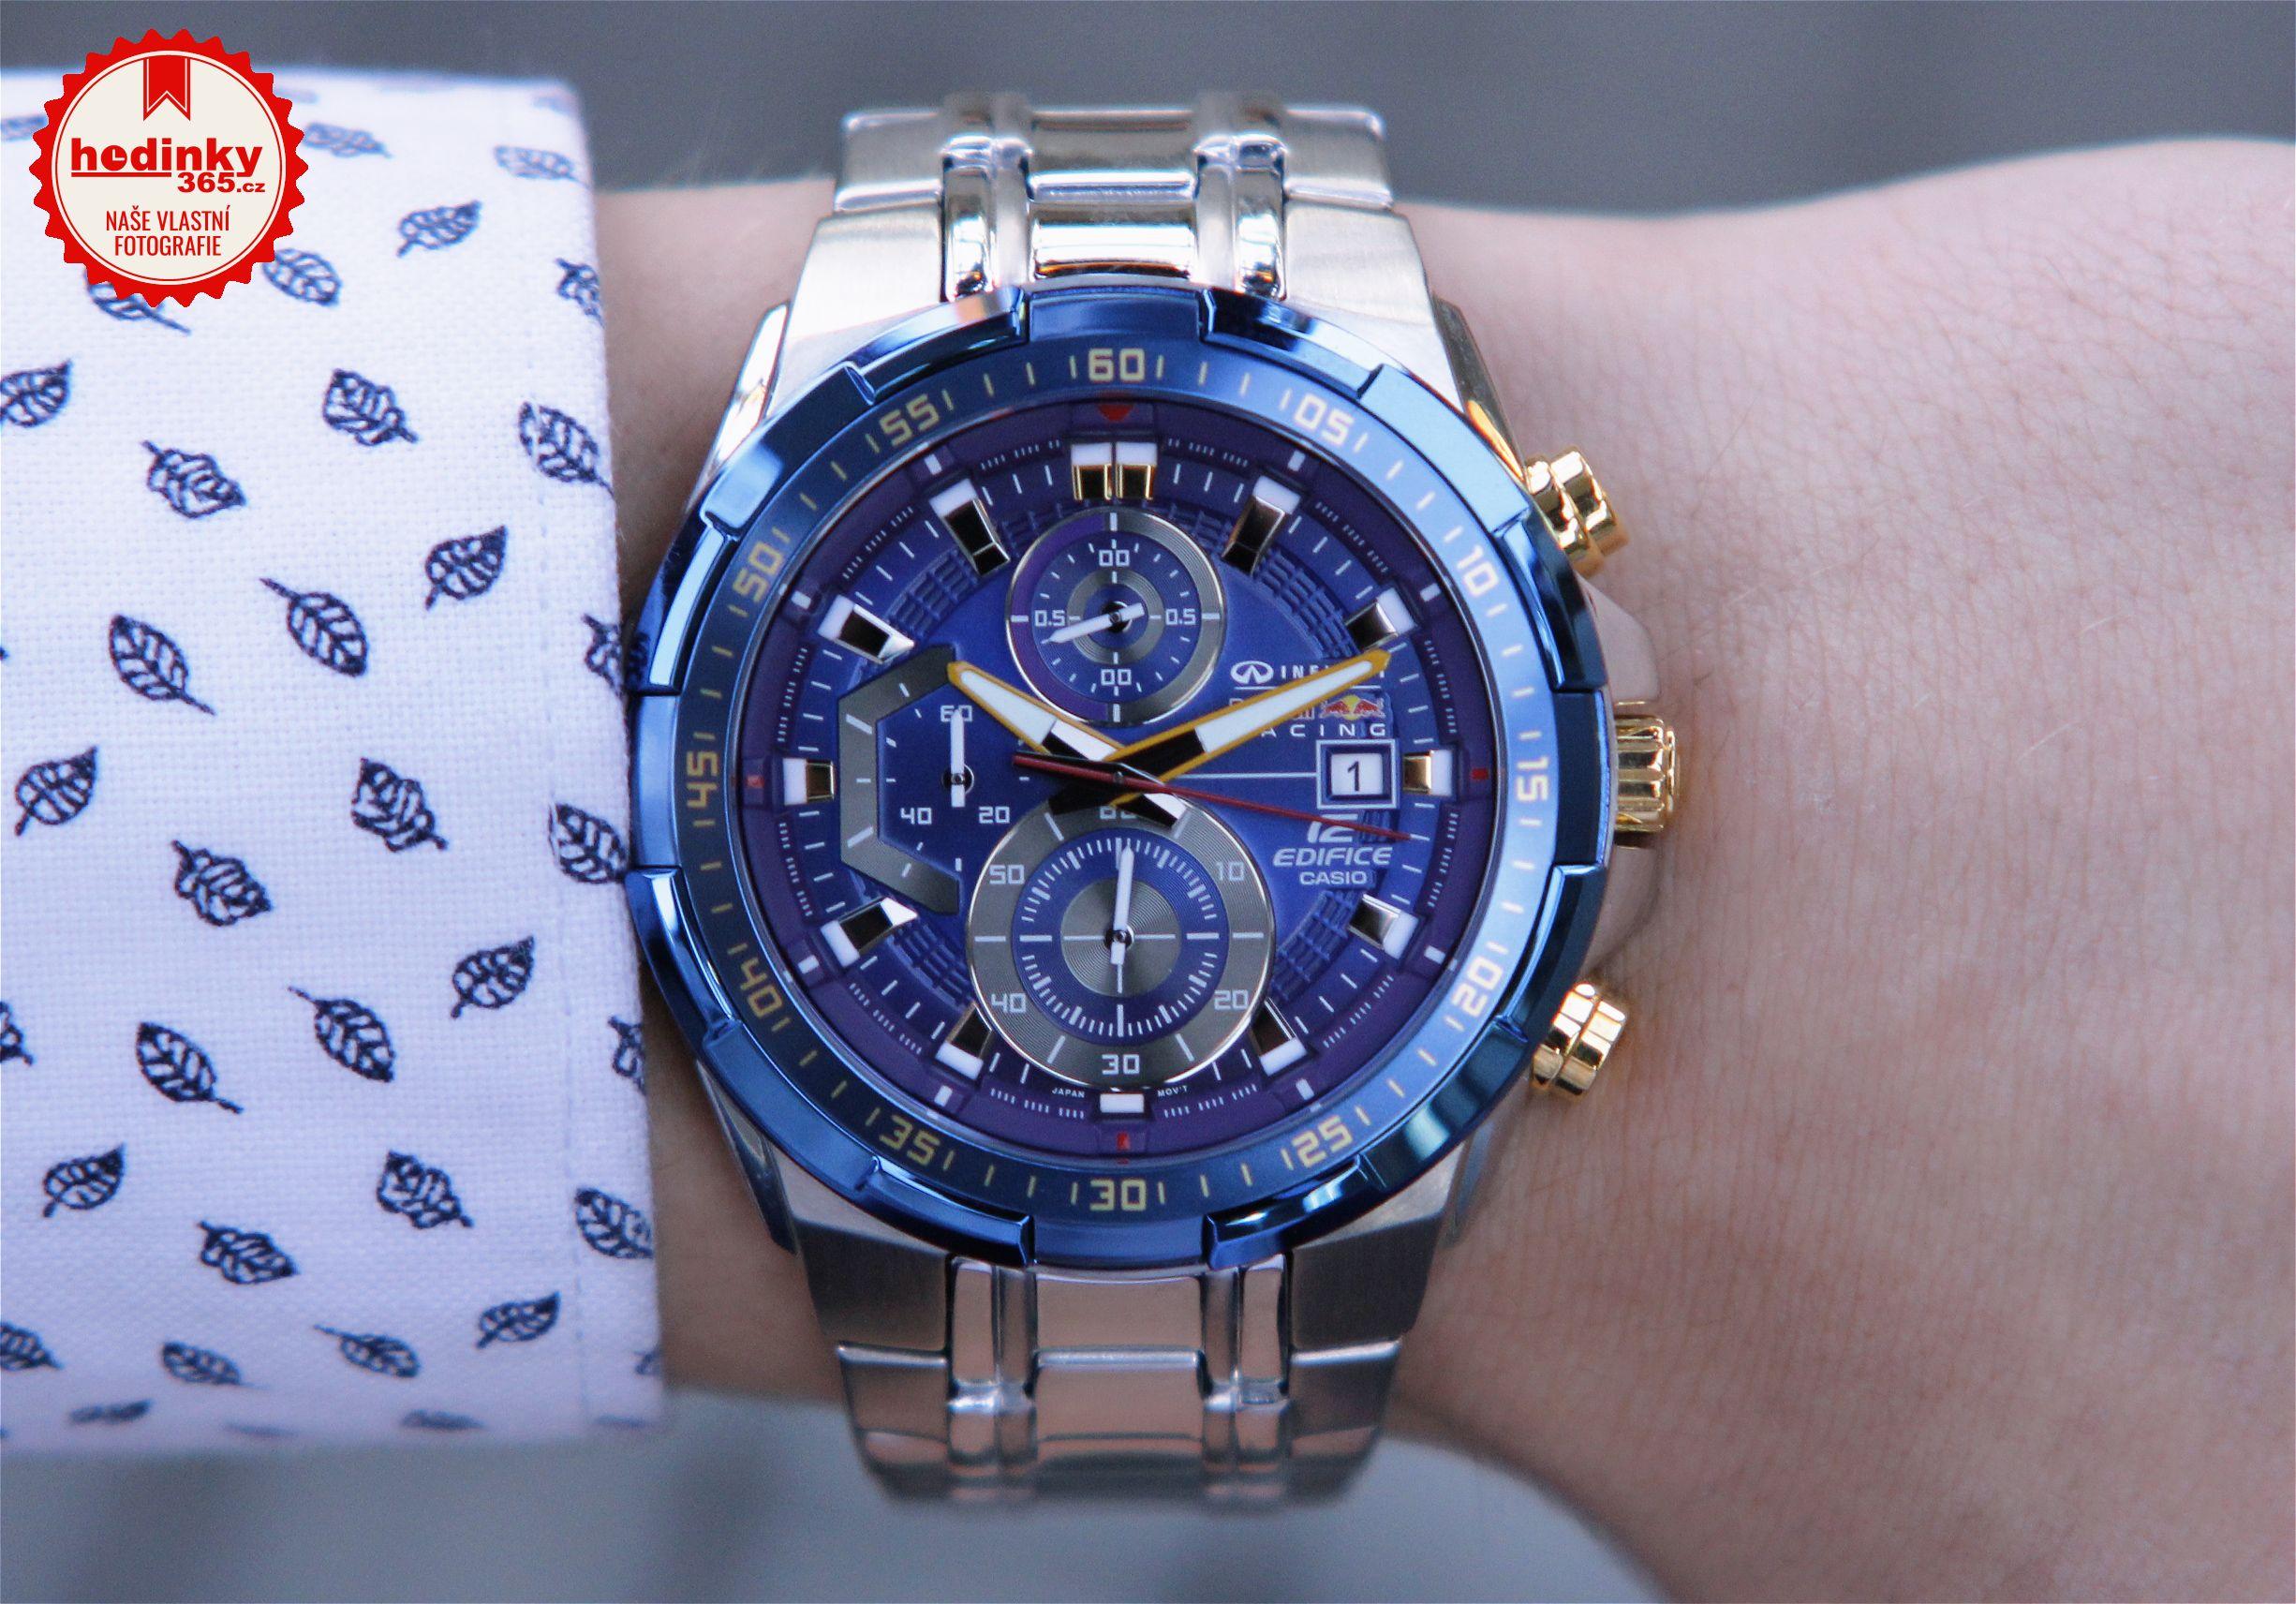 Casio Edifice EFR-539RB-2AER Infiniti Red Bull Racing Limited Edition. Pánské  hodinky - ocelový řemínek 143ae56f39